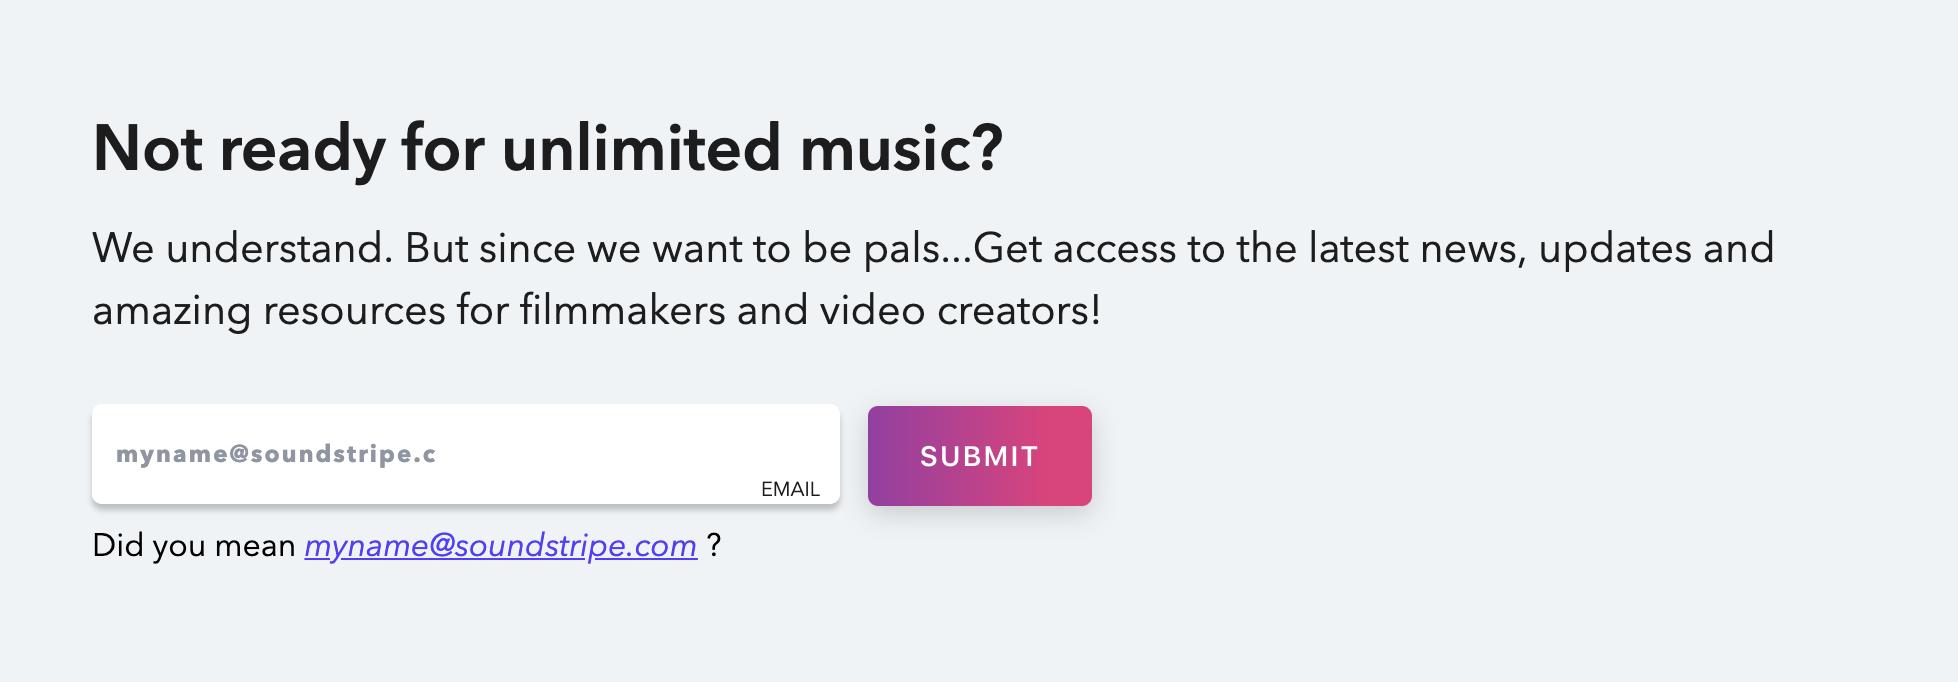 Did you mean myname@soundstripe.com